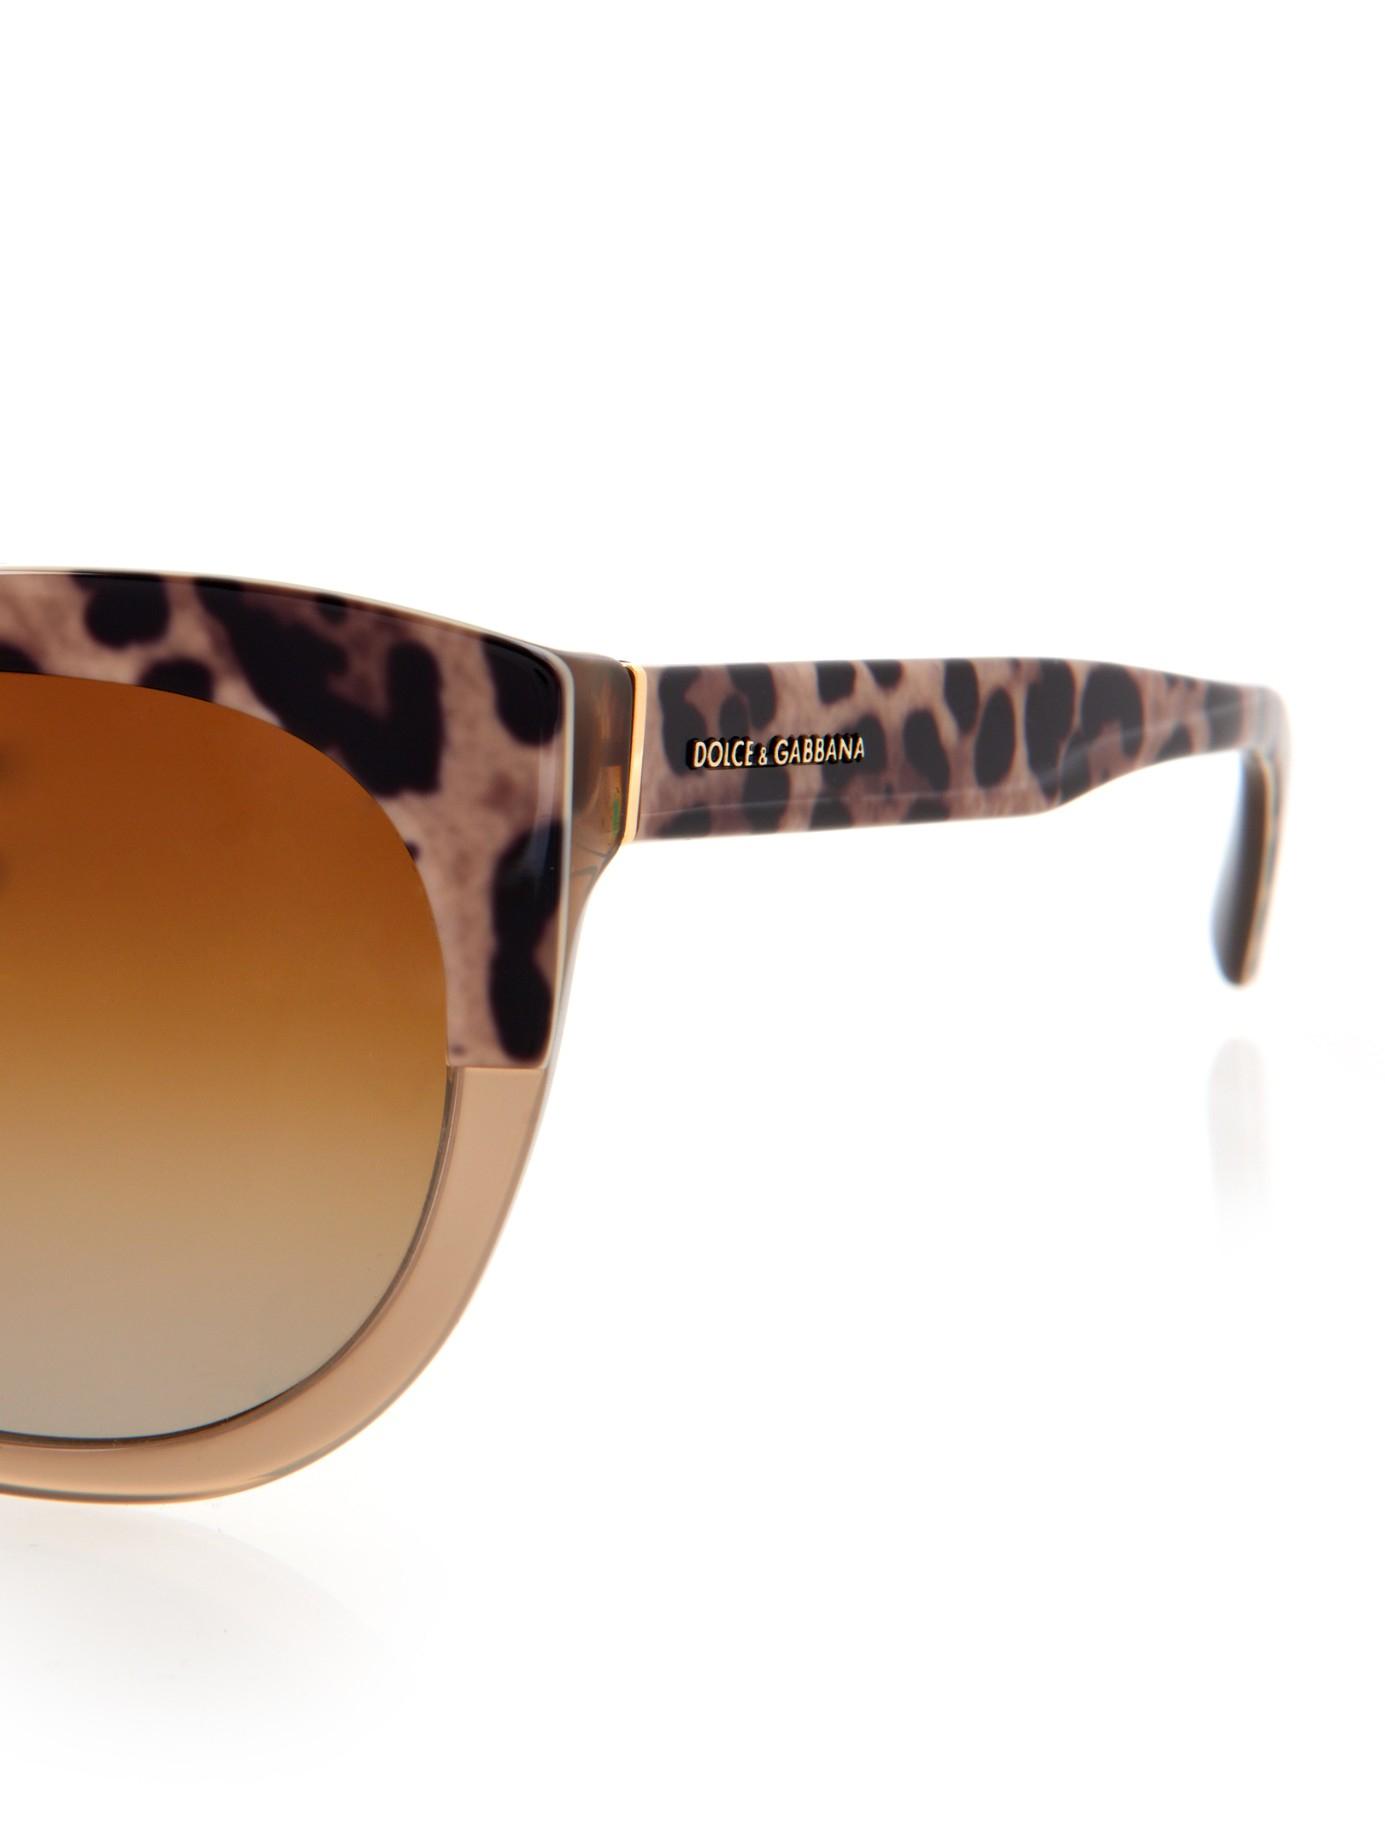 Dolce And Gabbana Gold Frame Sunglasses : Dolce & gabbana Half Leopard-Print Round Framed Sunglasses ...